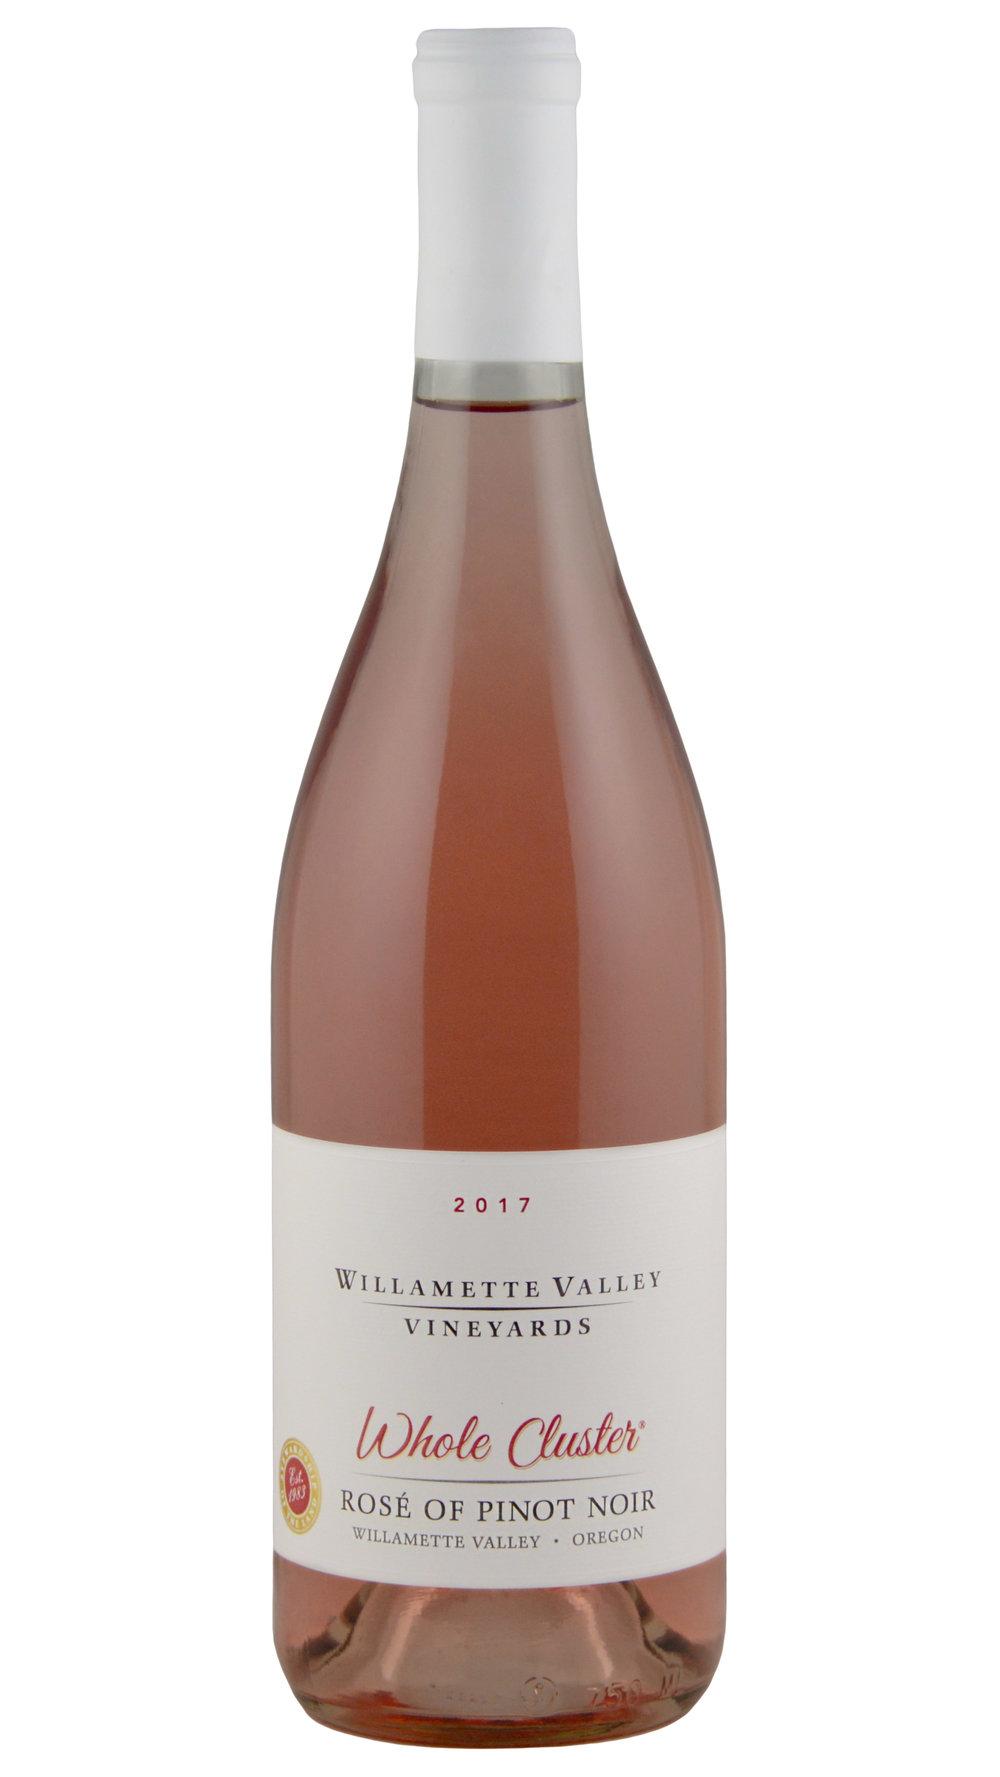 Whole Cluster Rosé of Pinot Noir 2017 -